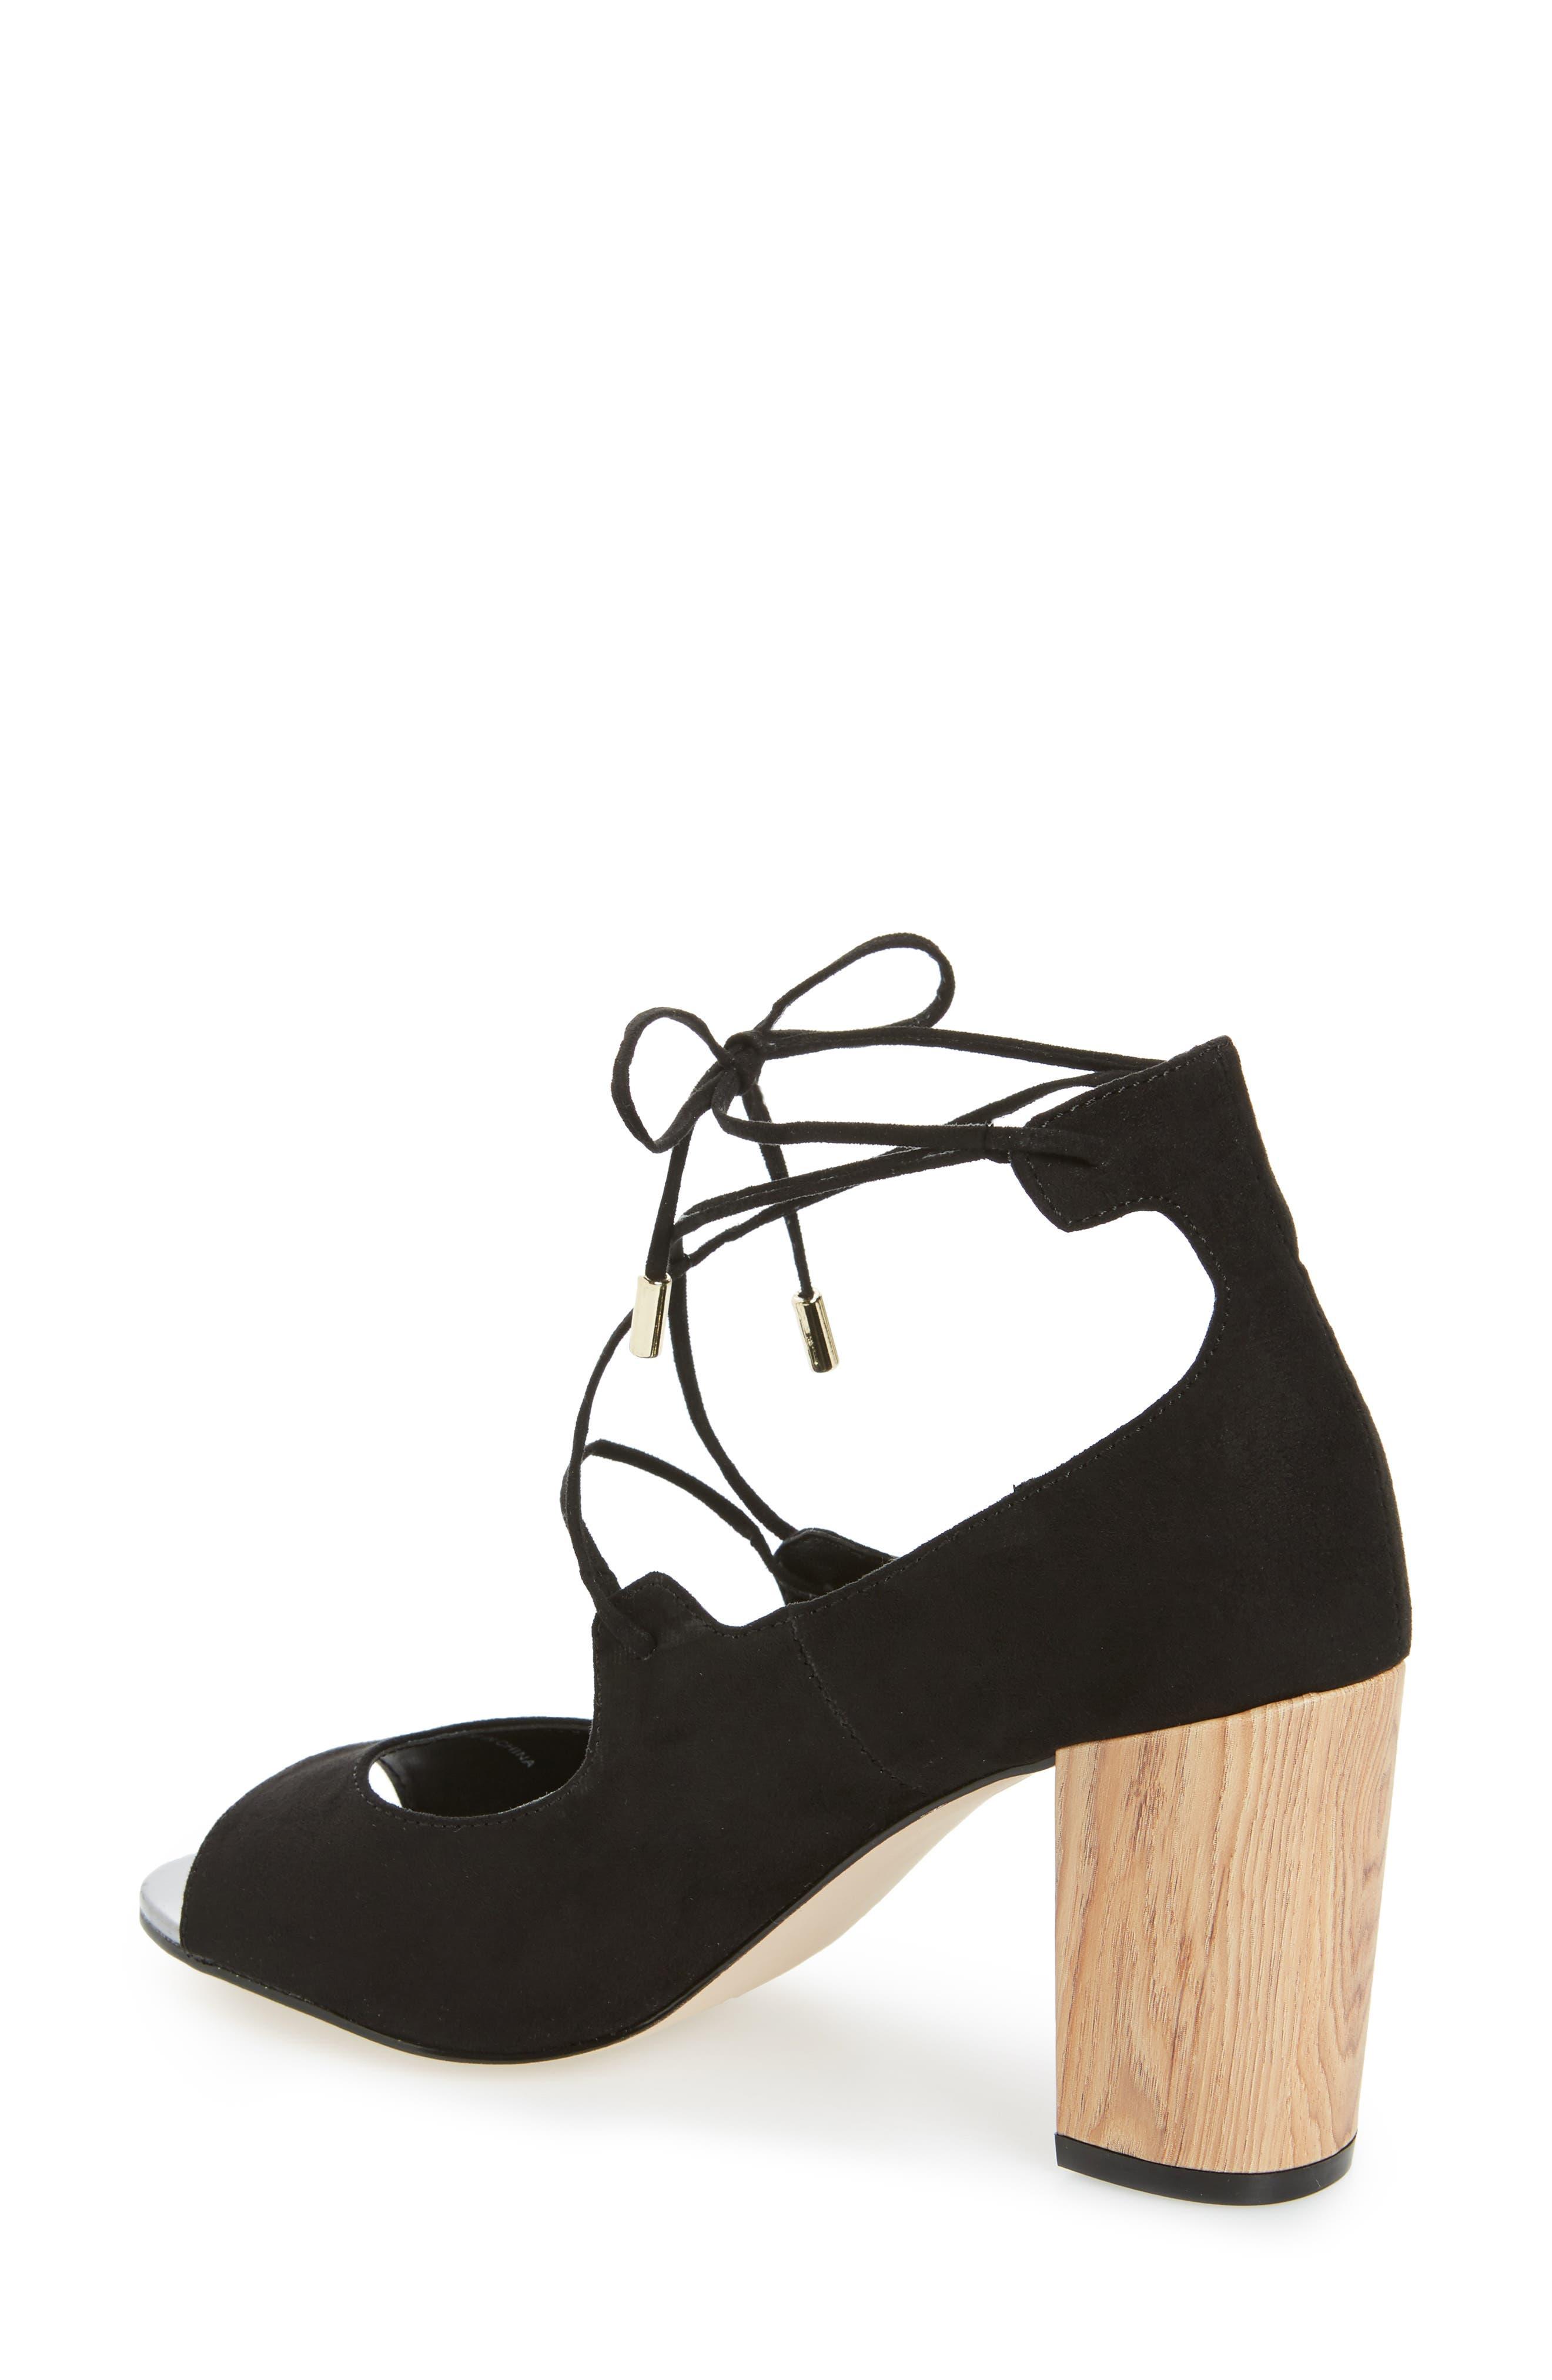 Vikki Block Heel Sandal,                             Alternate thumbnail 2, color,                             003